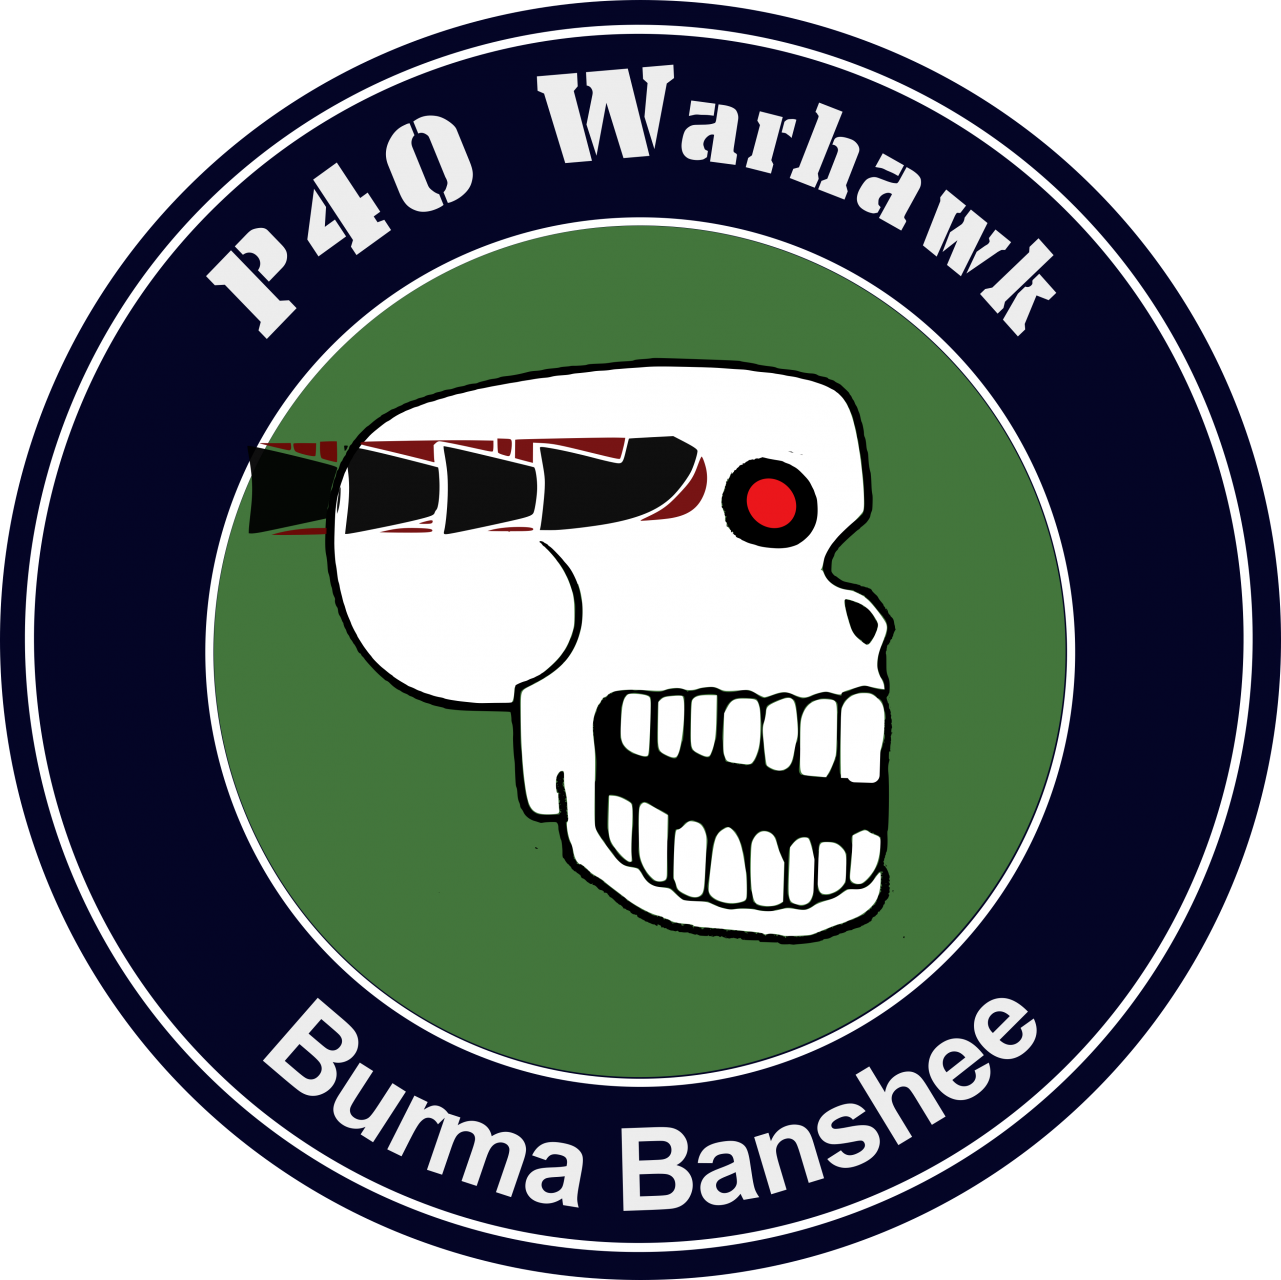 P40 Warhawk Banshee